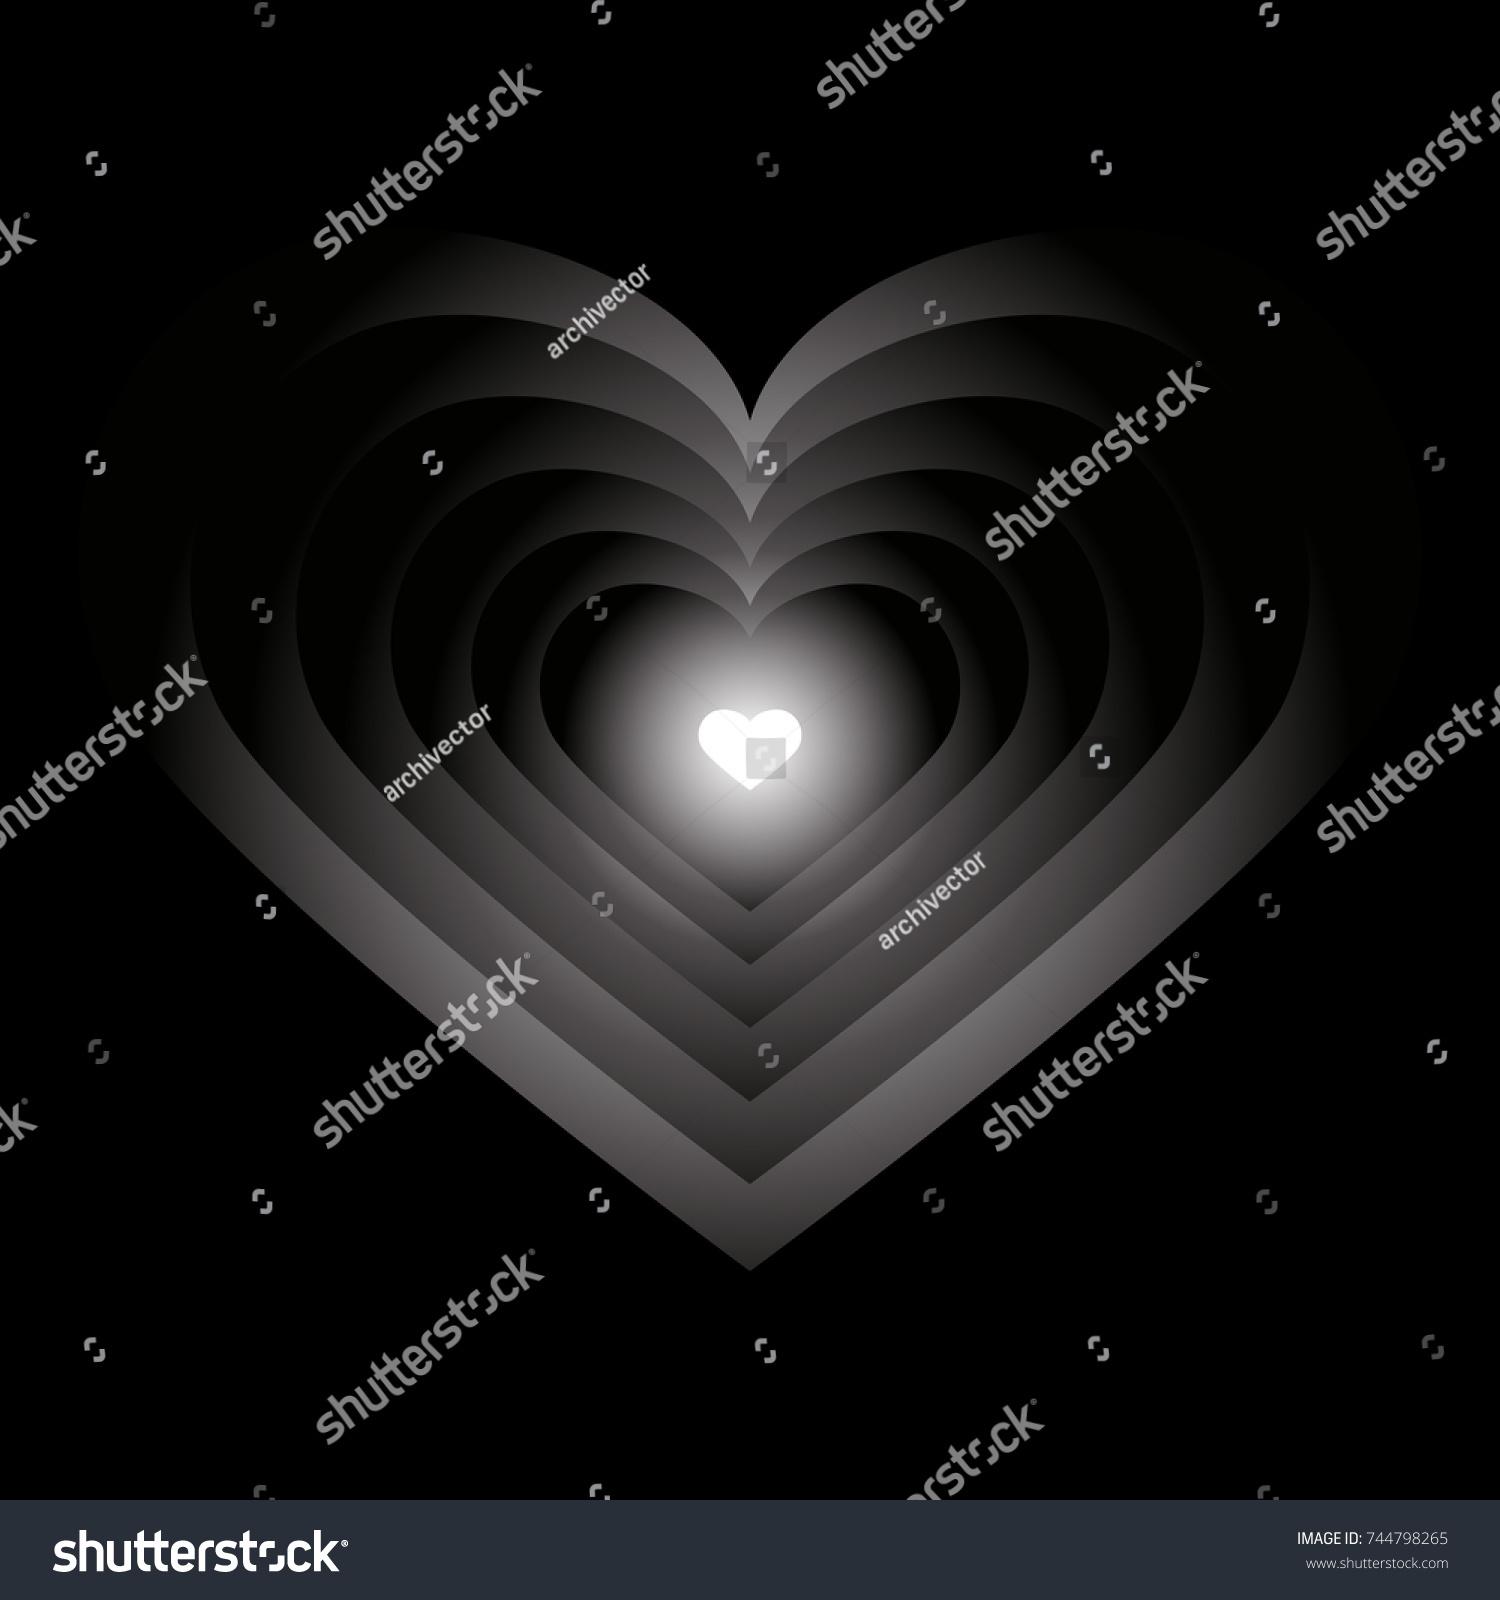 Abstract Symbol Light Hearts Darkness Vector Stock Vector 744798265